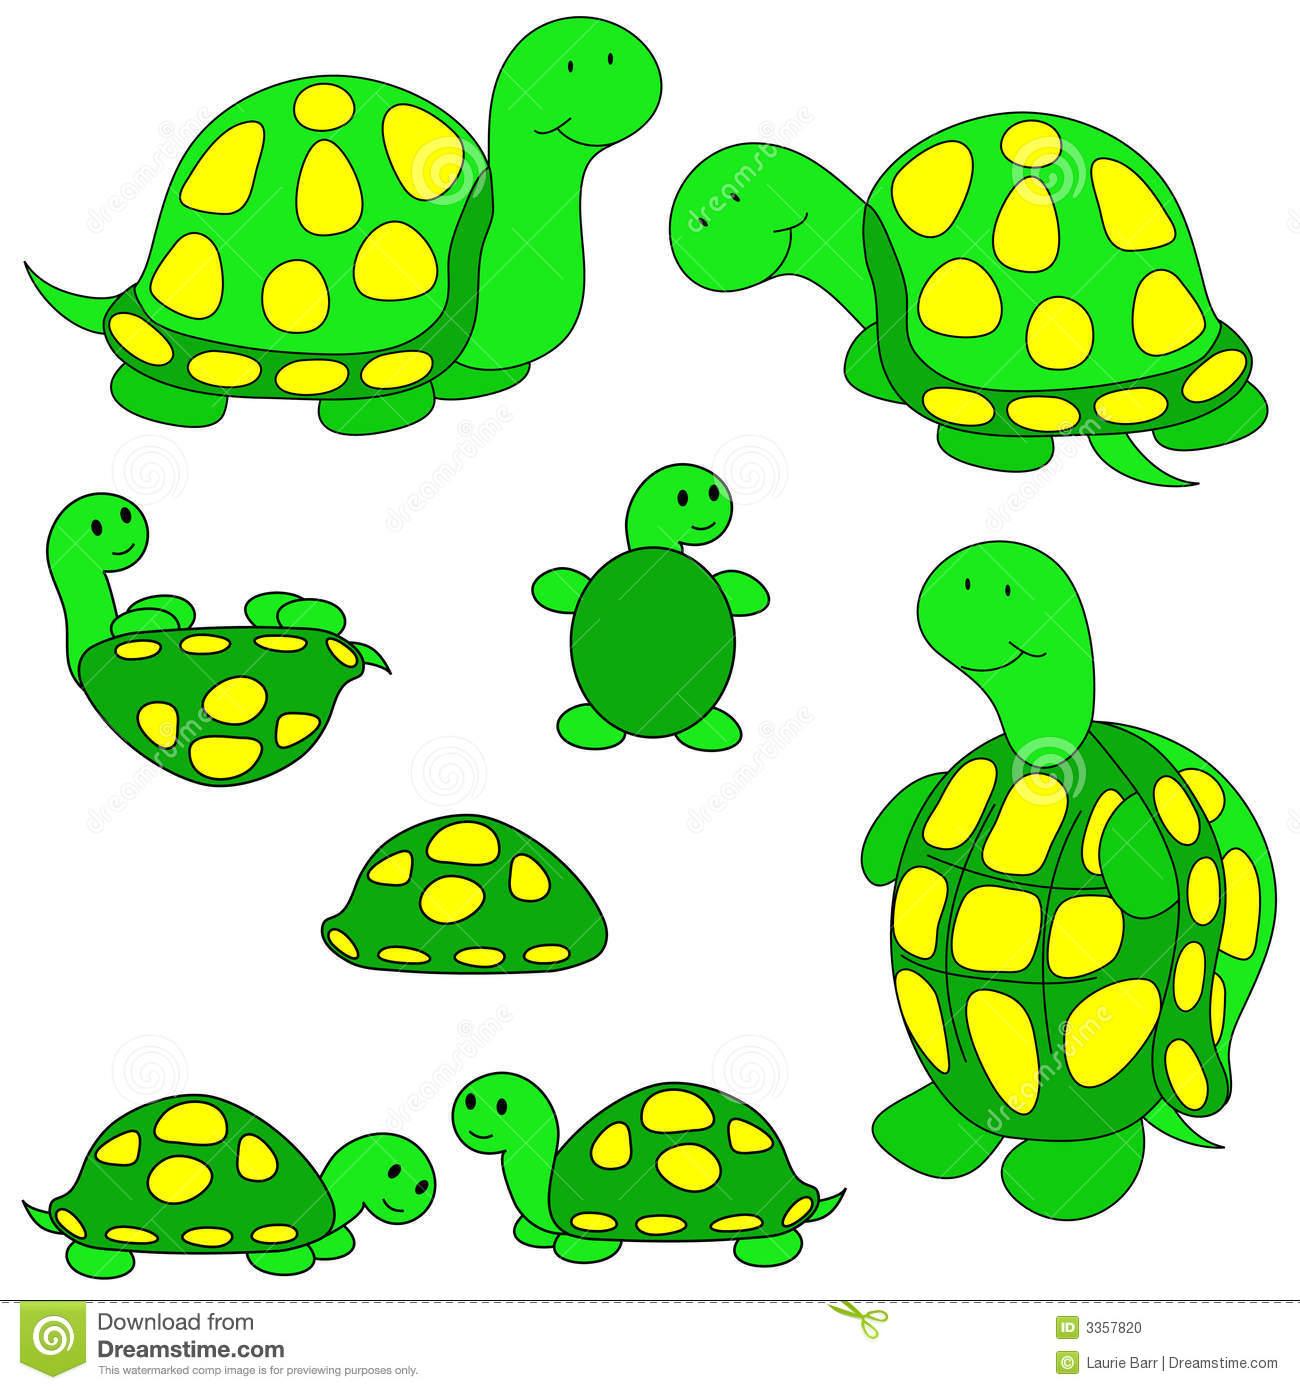 Turtle clip-art.-Turtle clip-art.-18